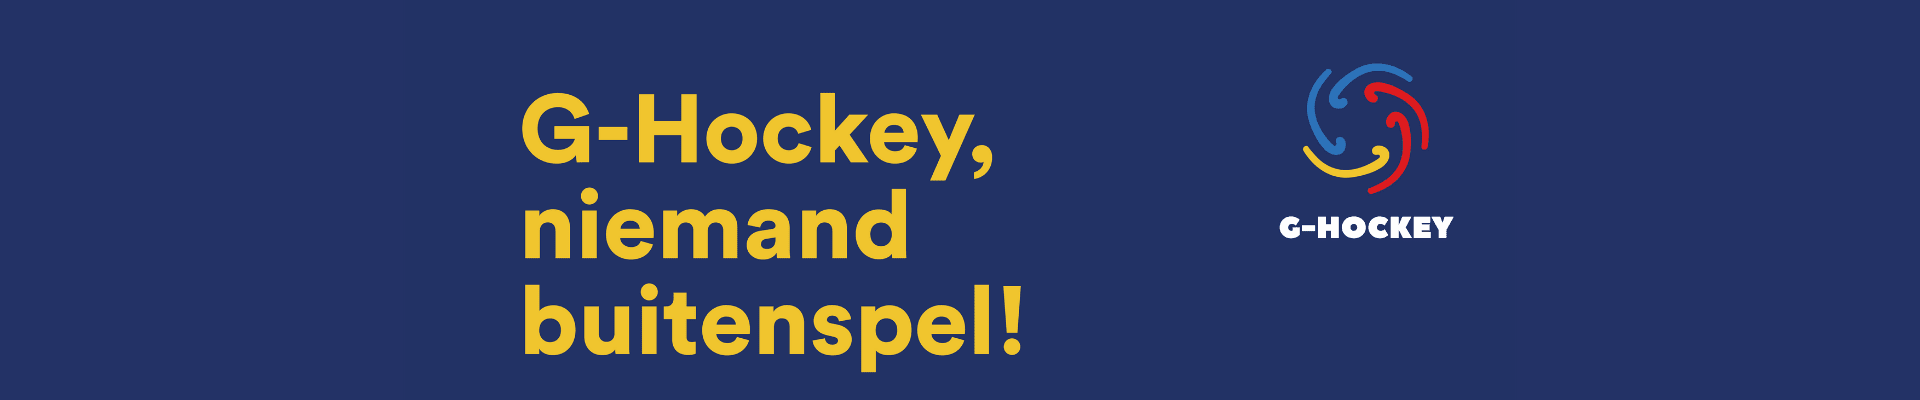 Gezocht: hulp bij oprichting G-hockey